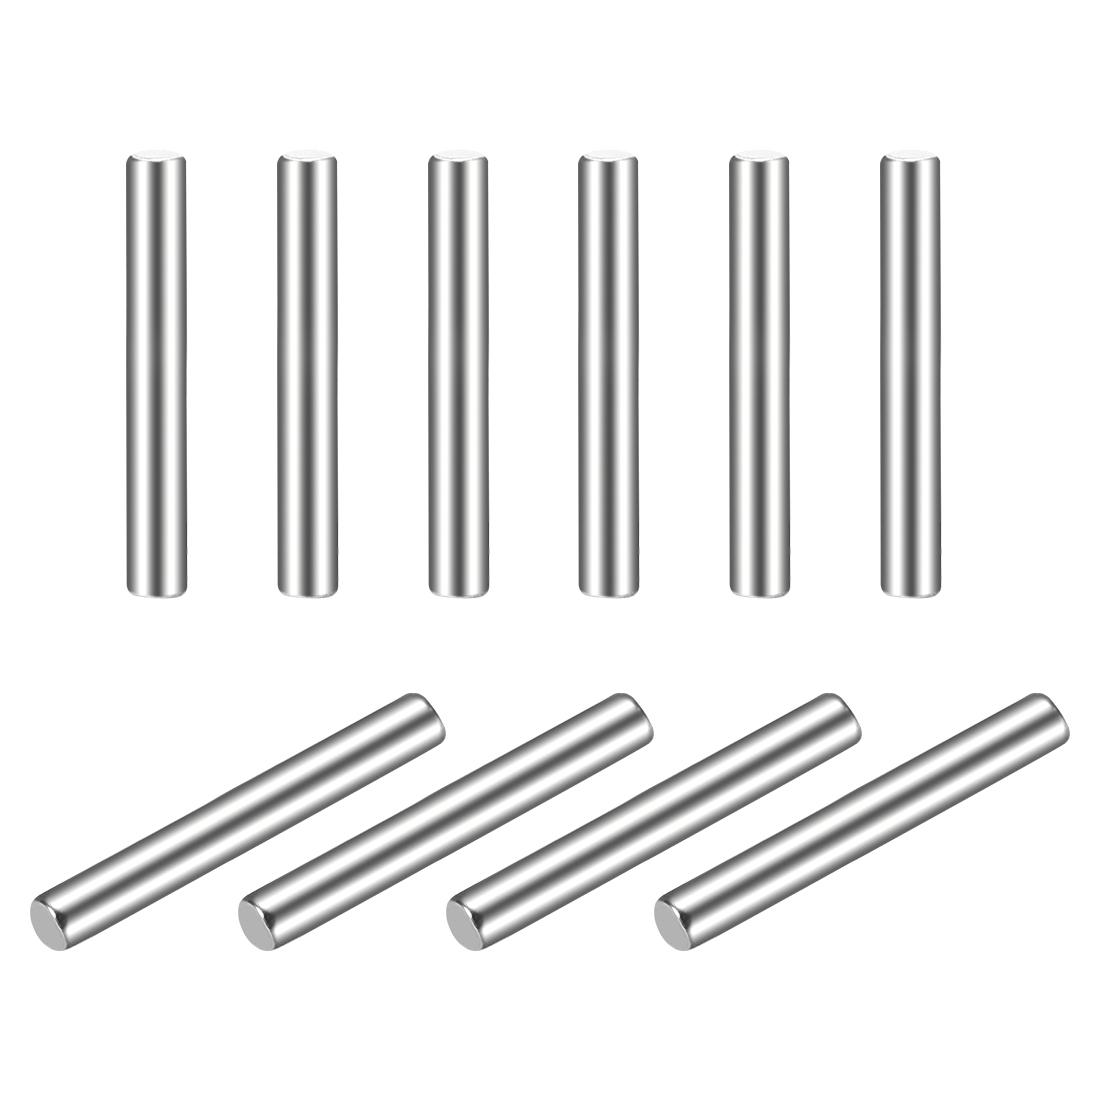 10Pcs 2mm x 16mm Dowel Pin 304 Stainless Steel Shelf Support Pin Fasten